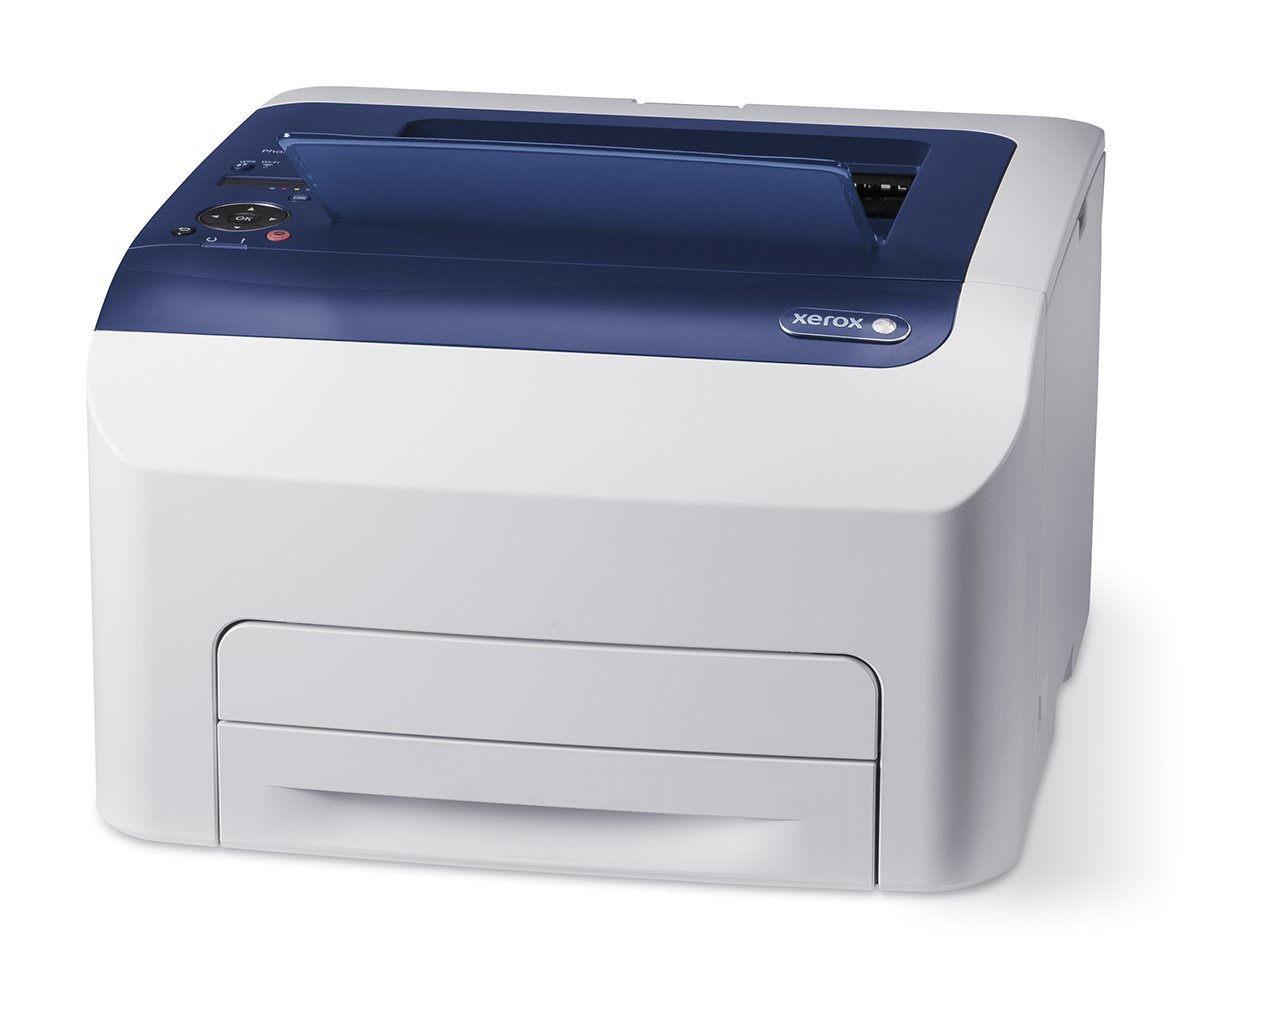 54% OFF Xerox Phaser 6022/NI Wireless Color Printer